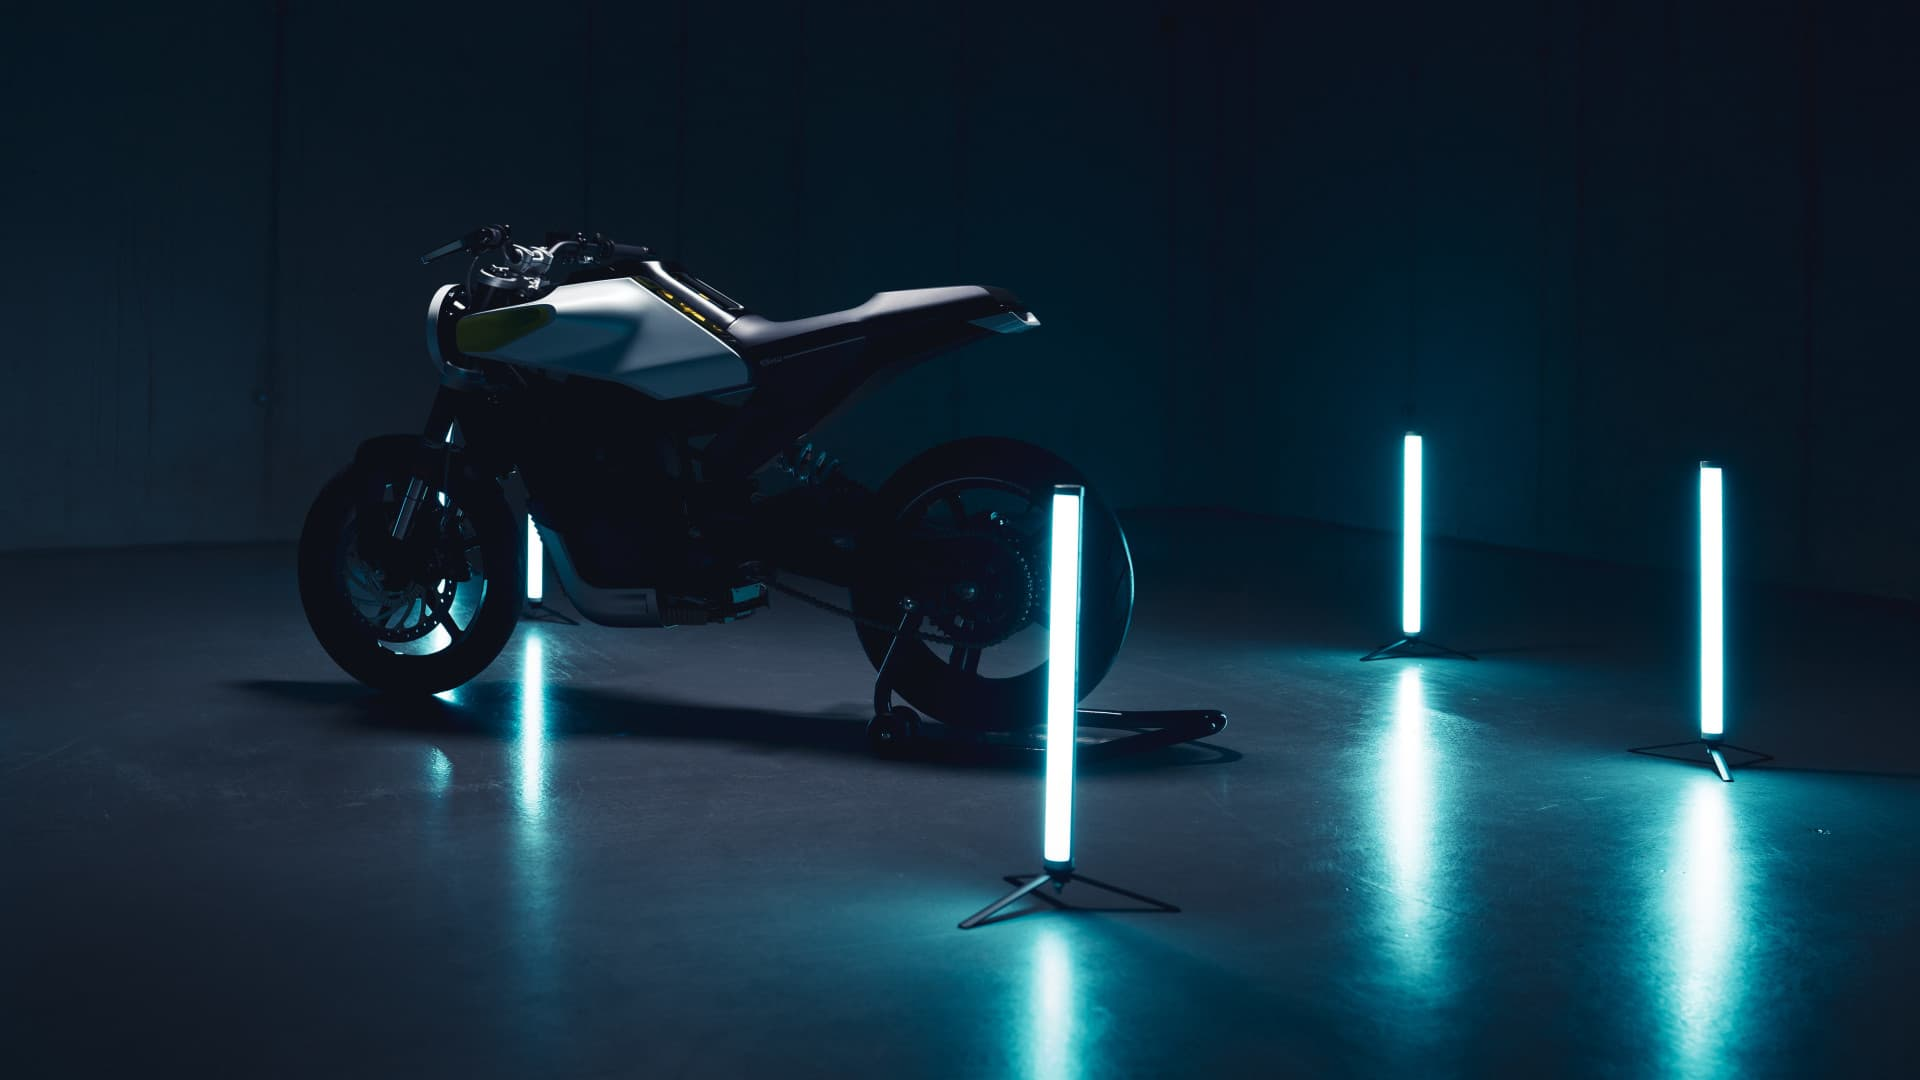 Husqvarna E Pilen Concept Moto Electrica 02